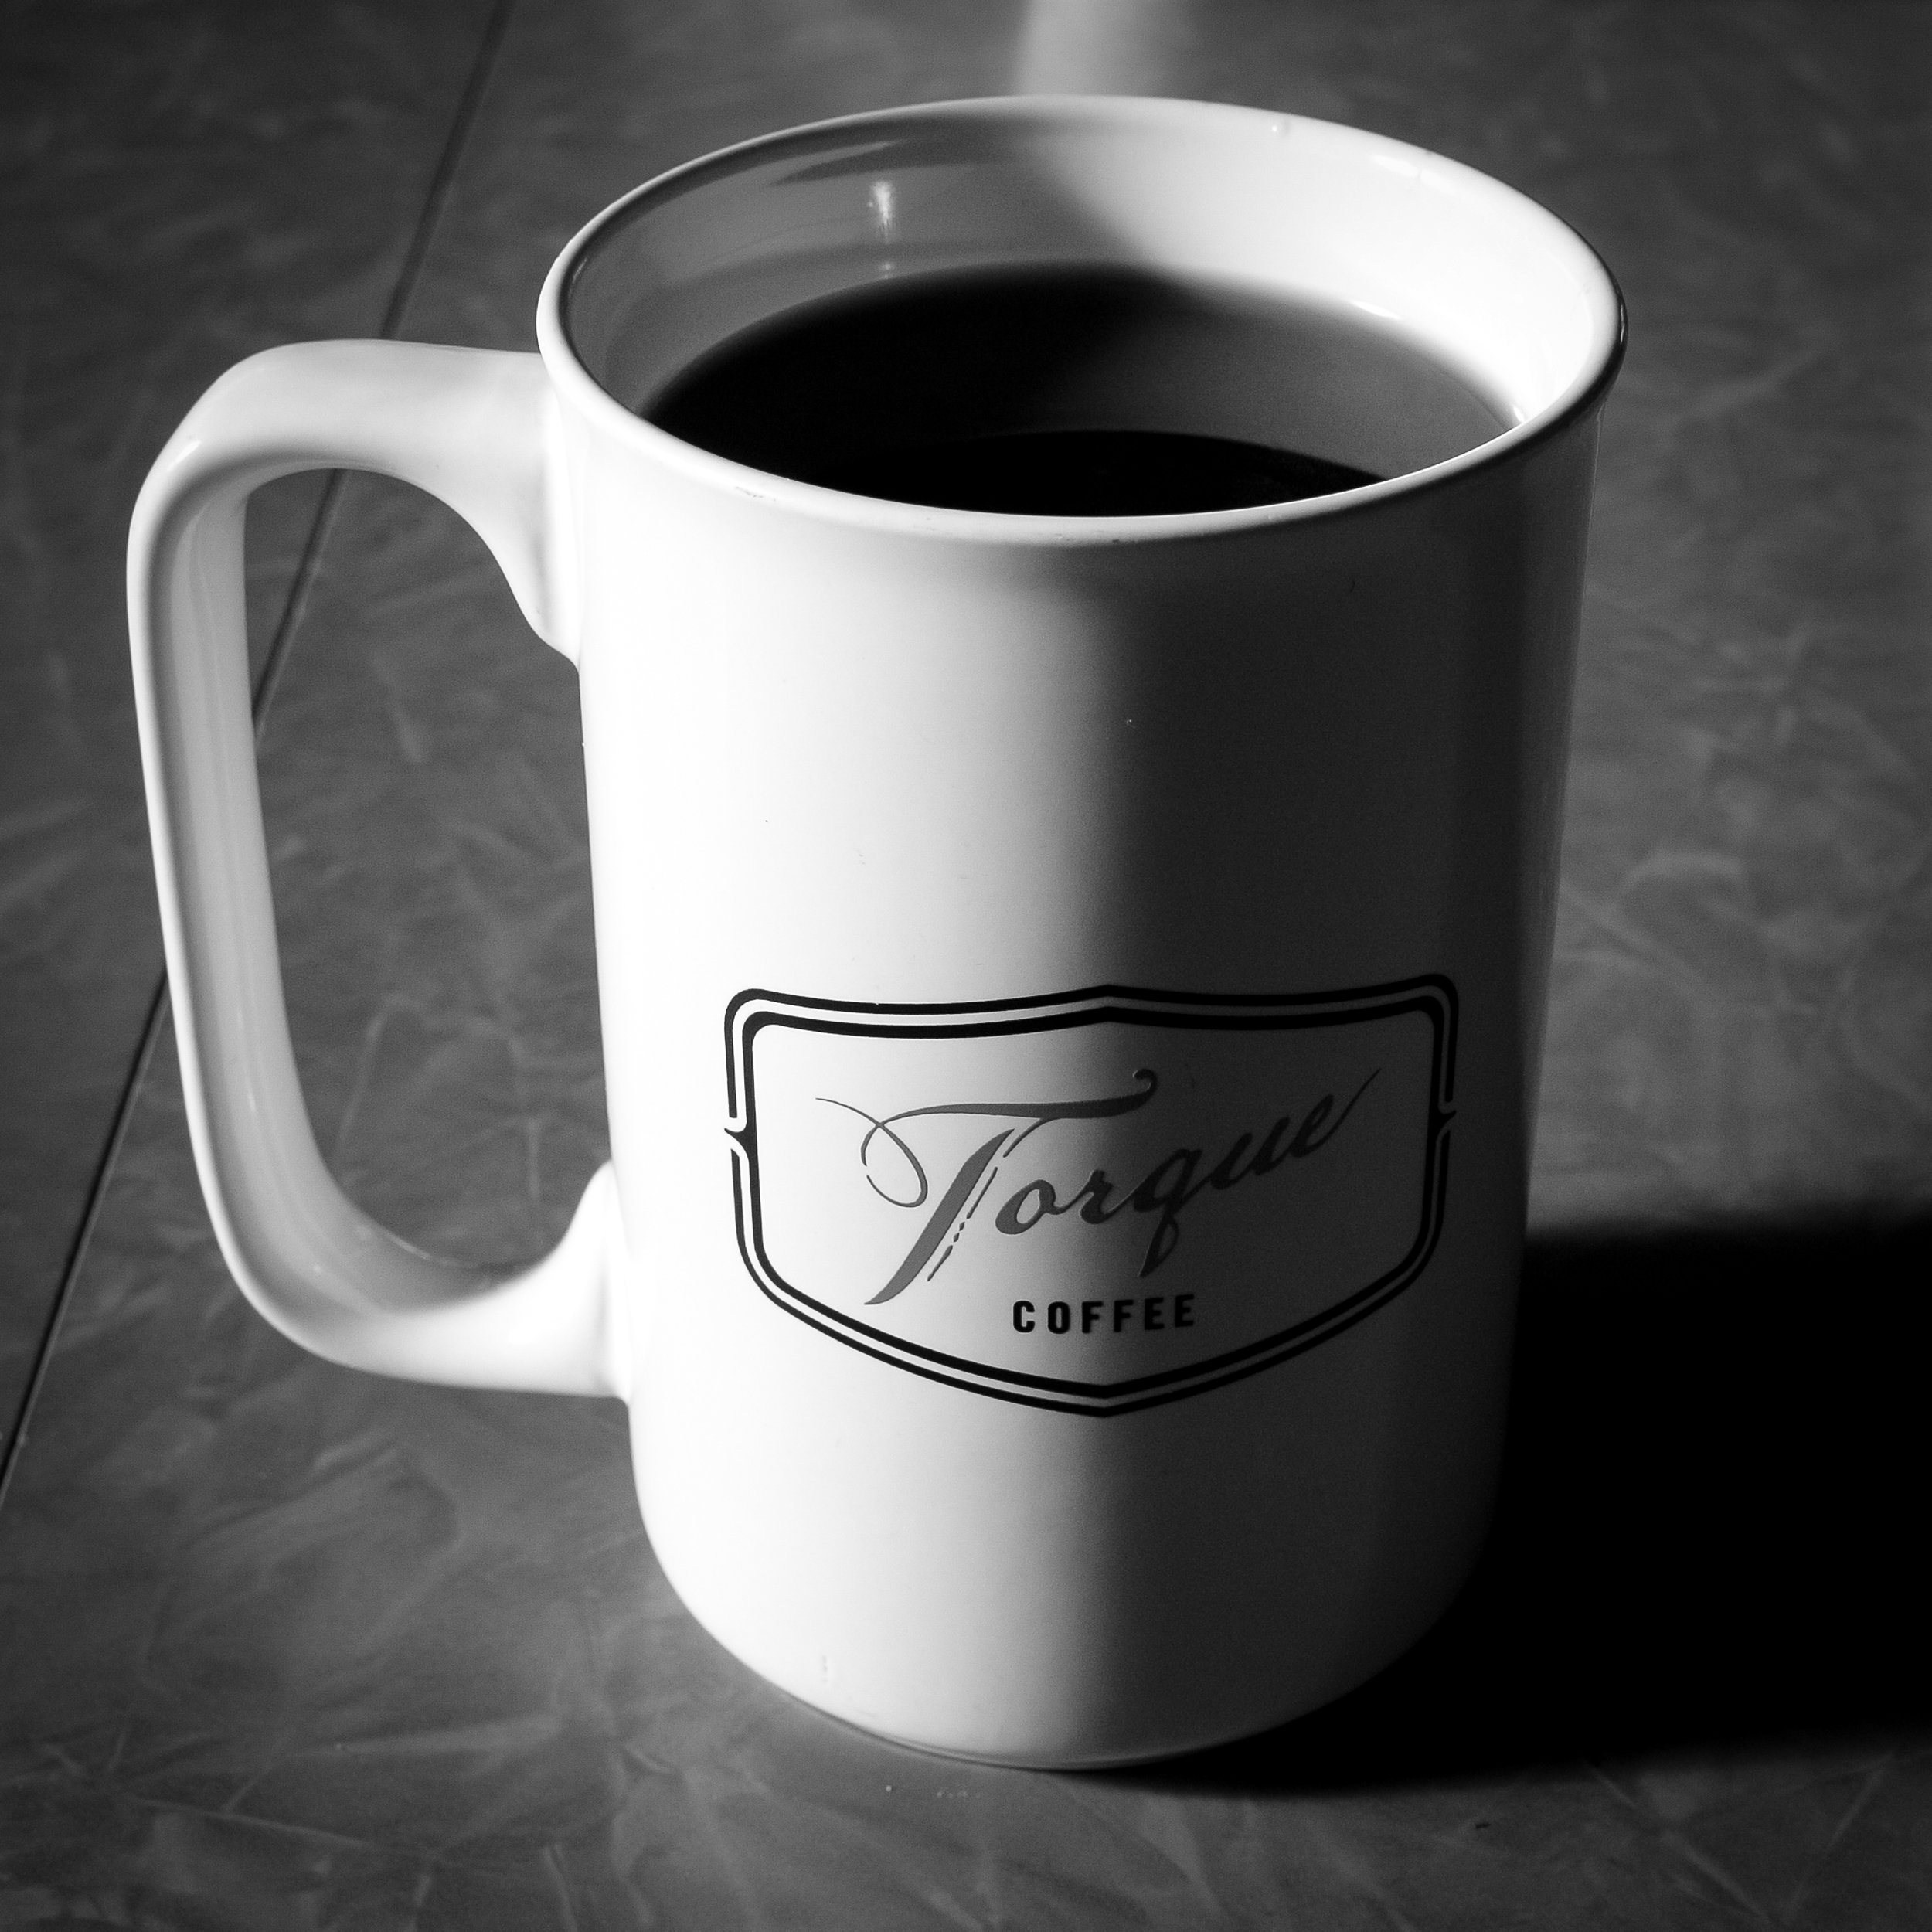 Torque Coffee, Vancouver, Washington, 2015